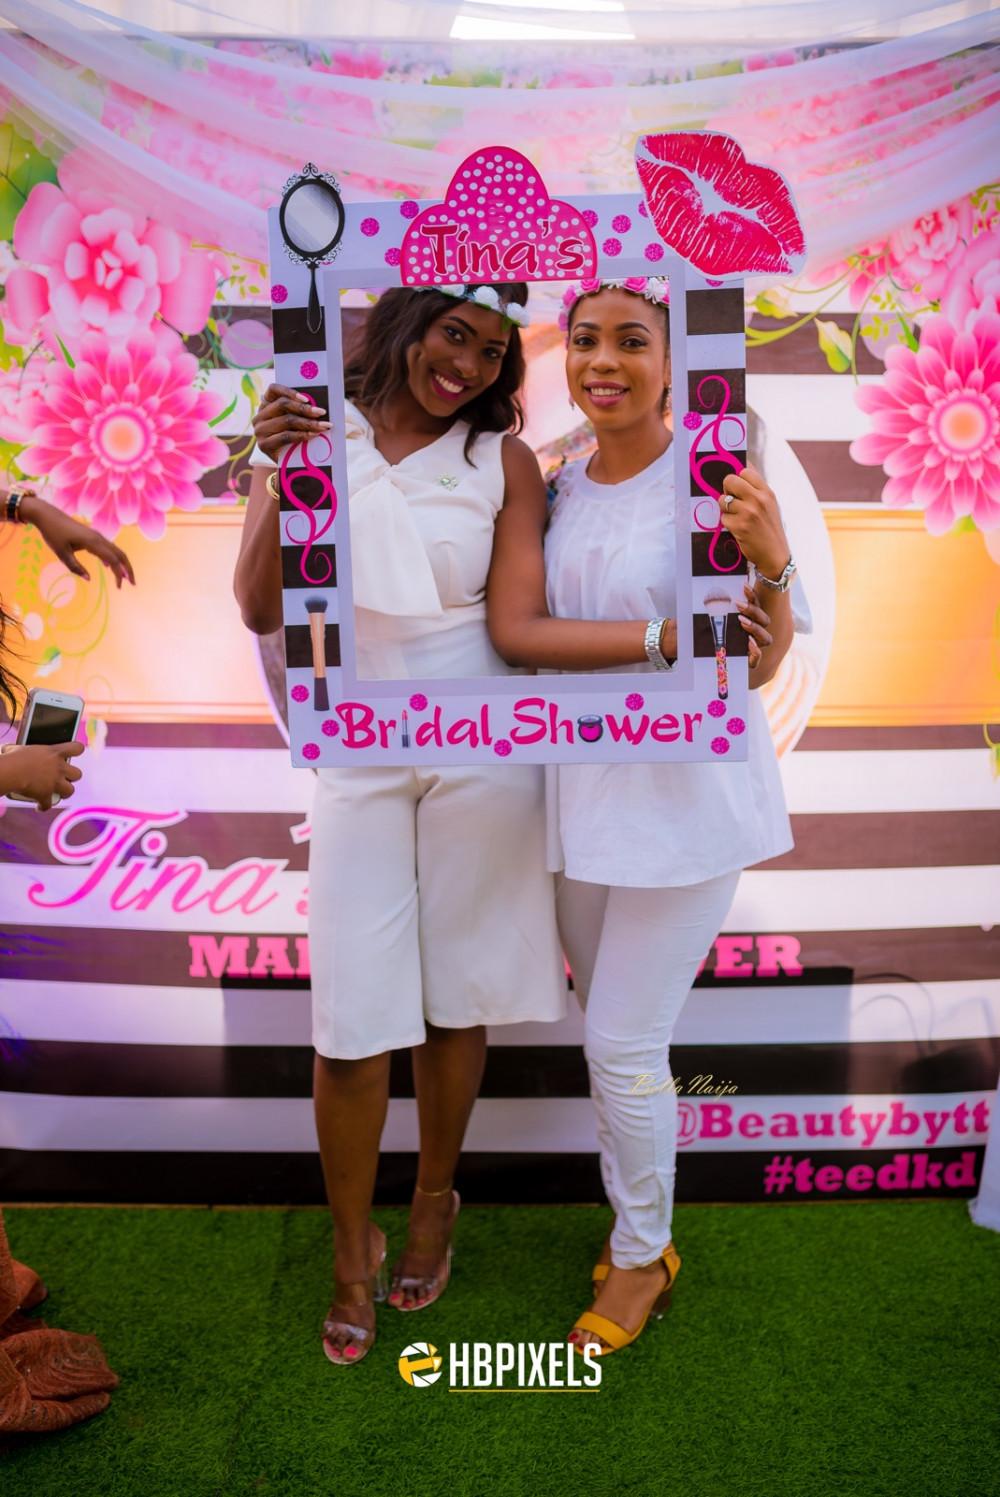 see bridal shower photos below